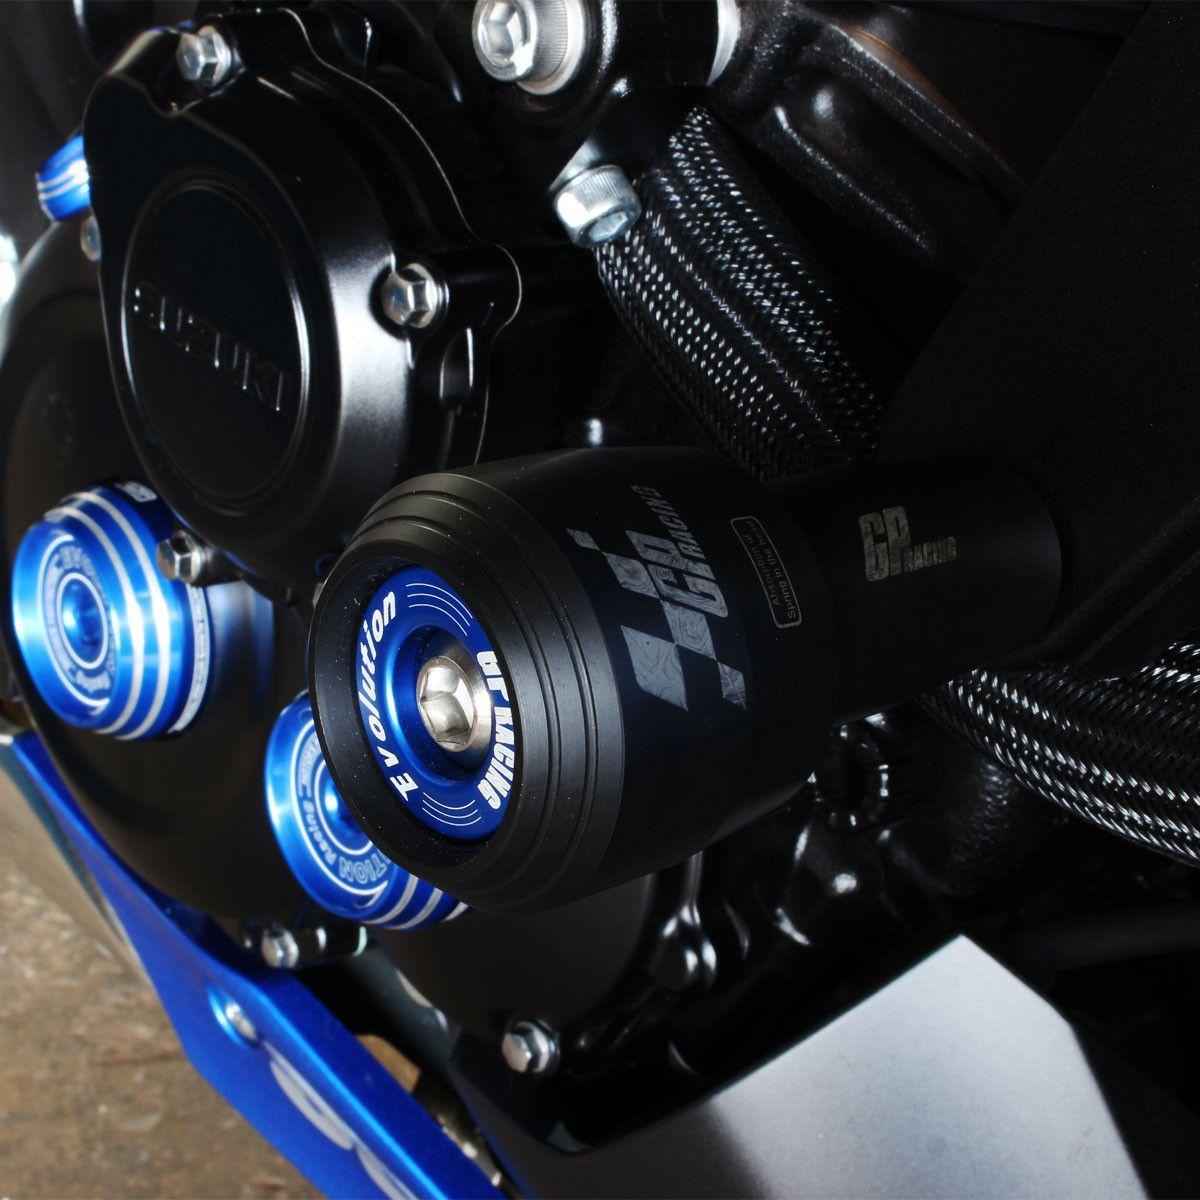 Slider Evolution GP Nylon Yamaha Fazer 250 12 13 14 15 16 17